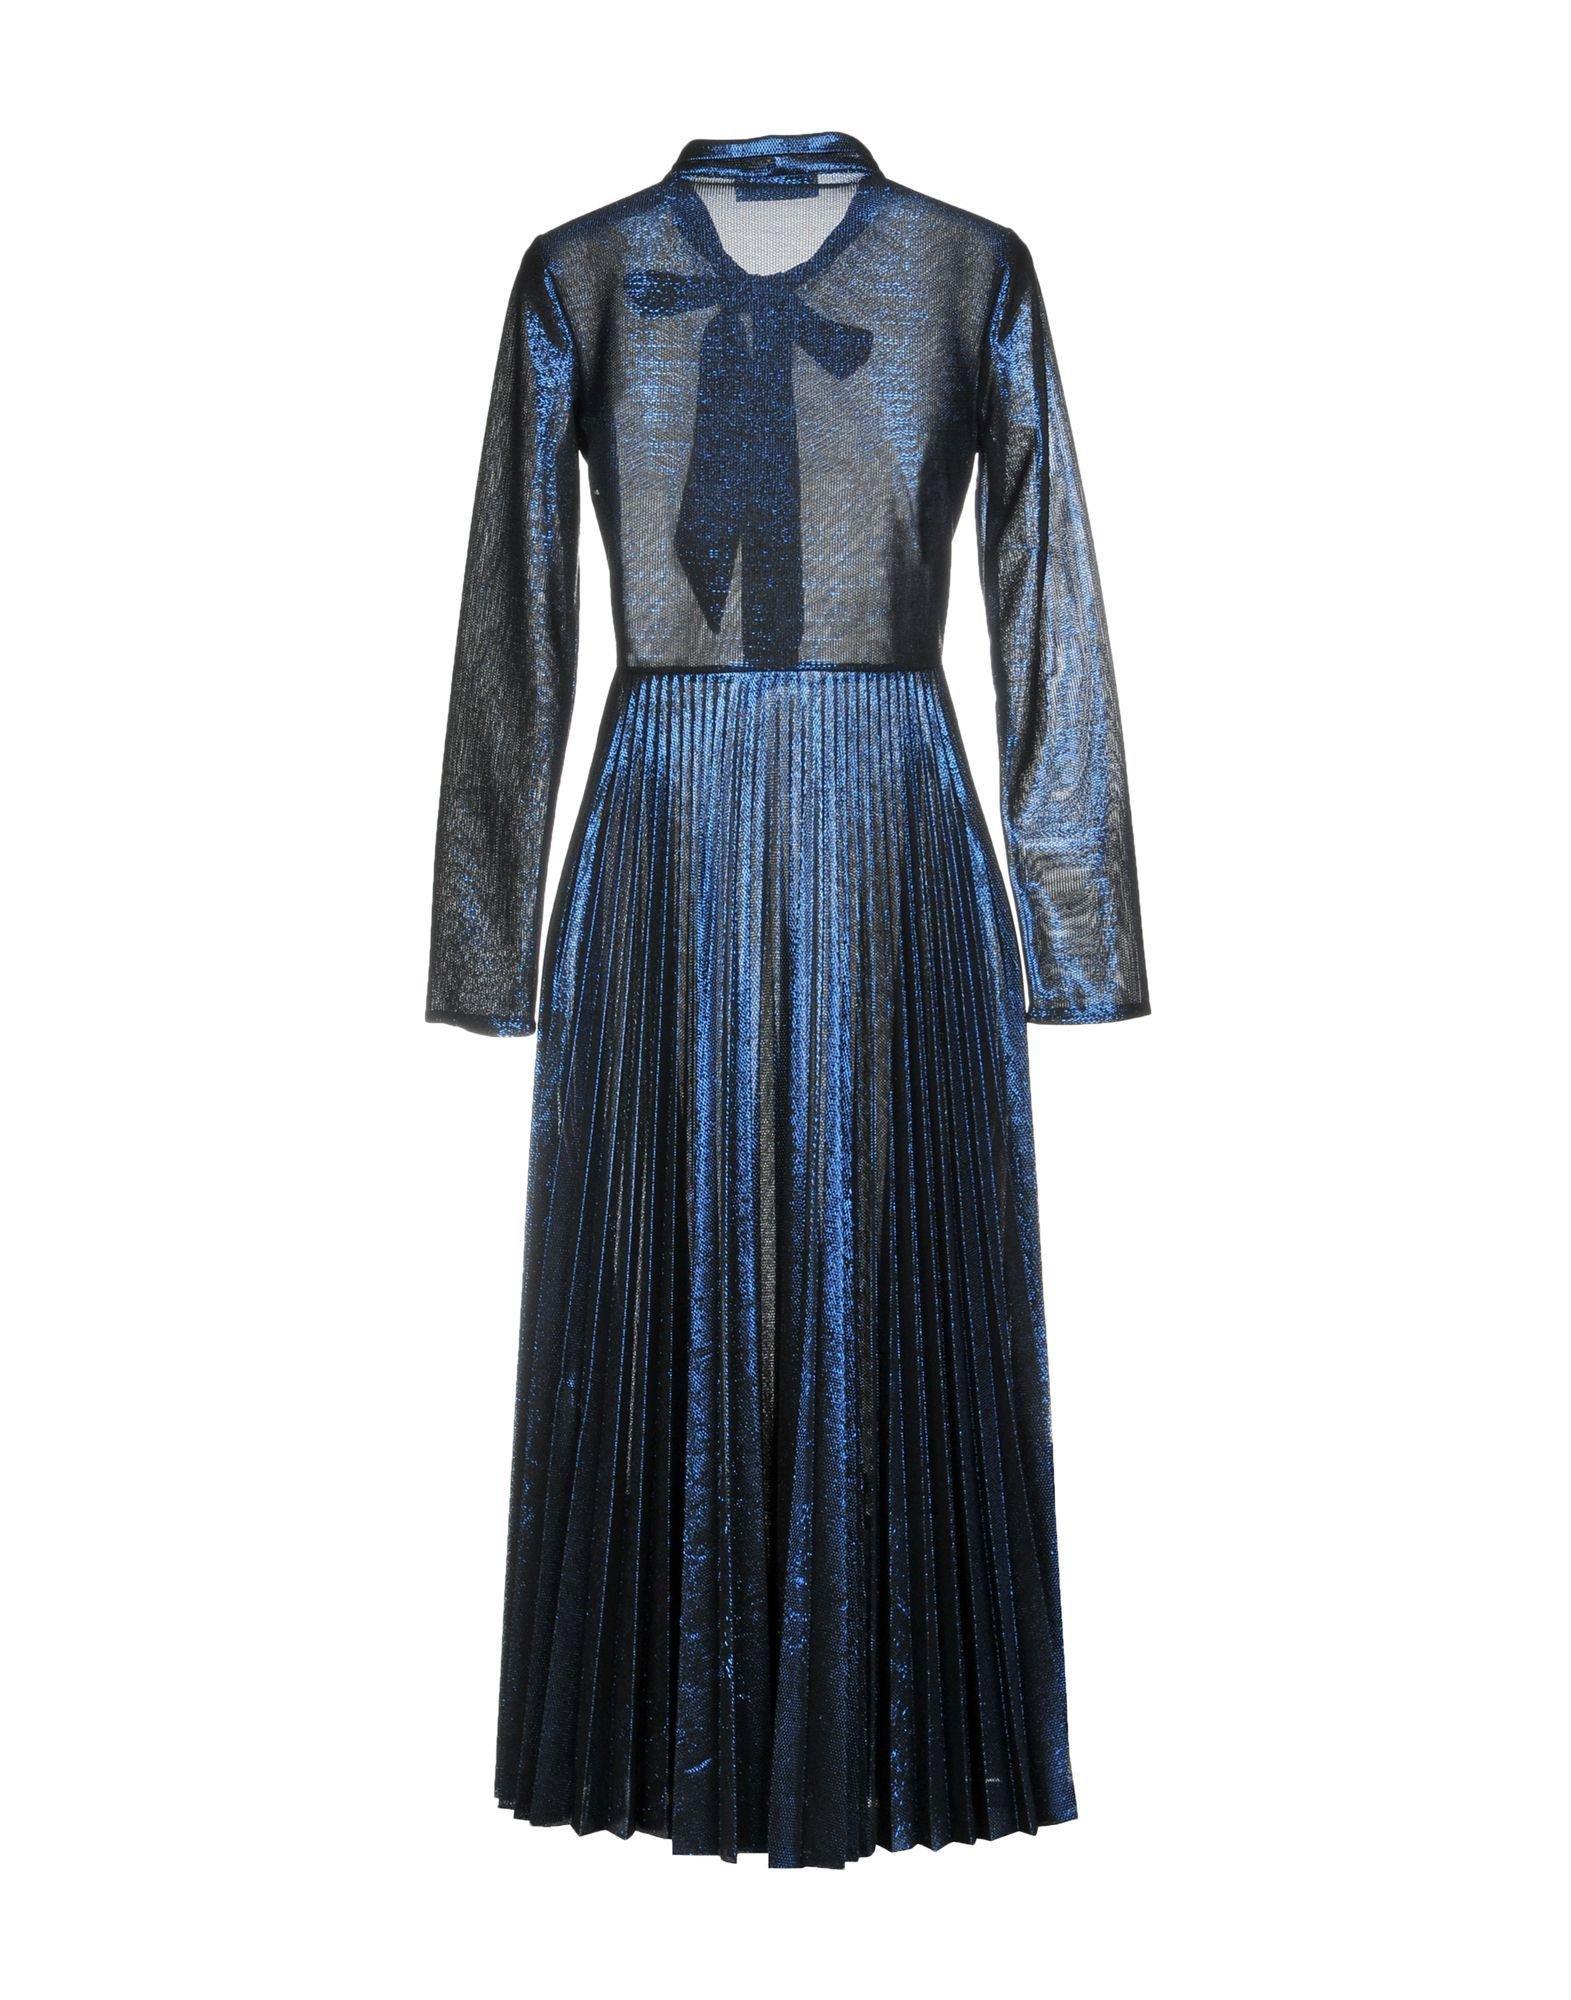 34 Aglini Lyst Blue Length Dress In Tzd45pwfqx